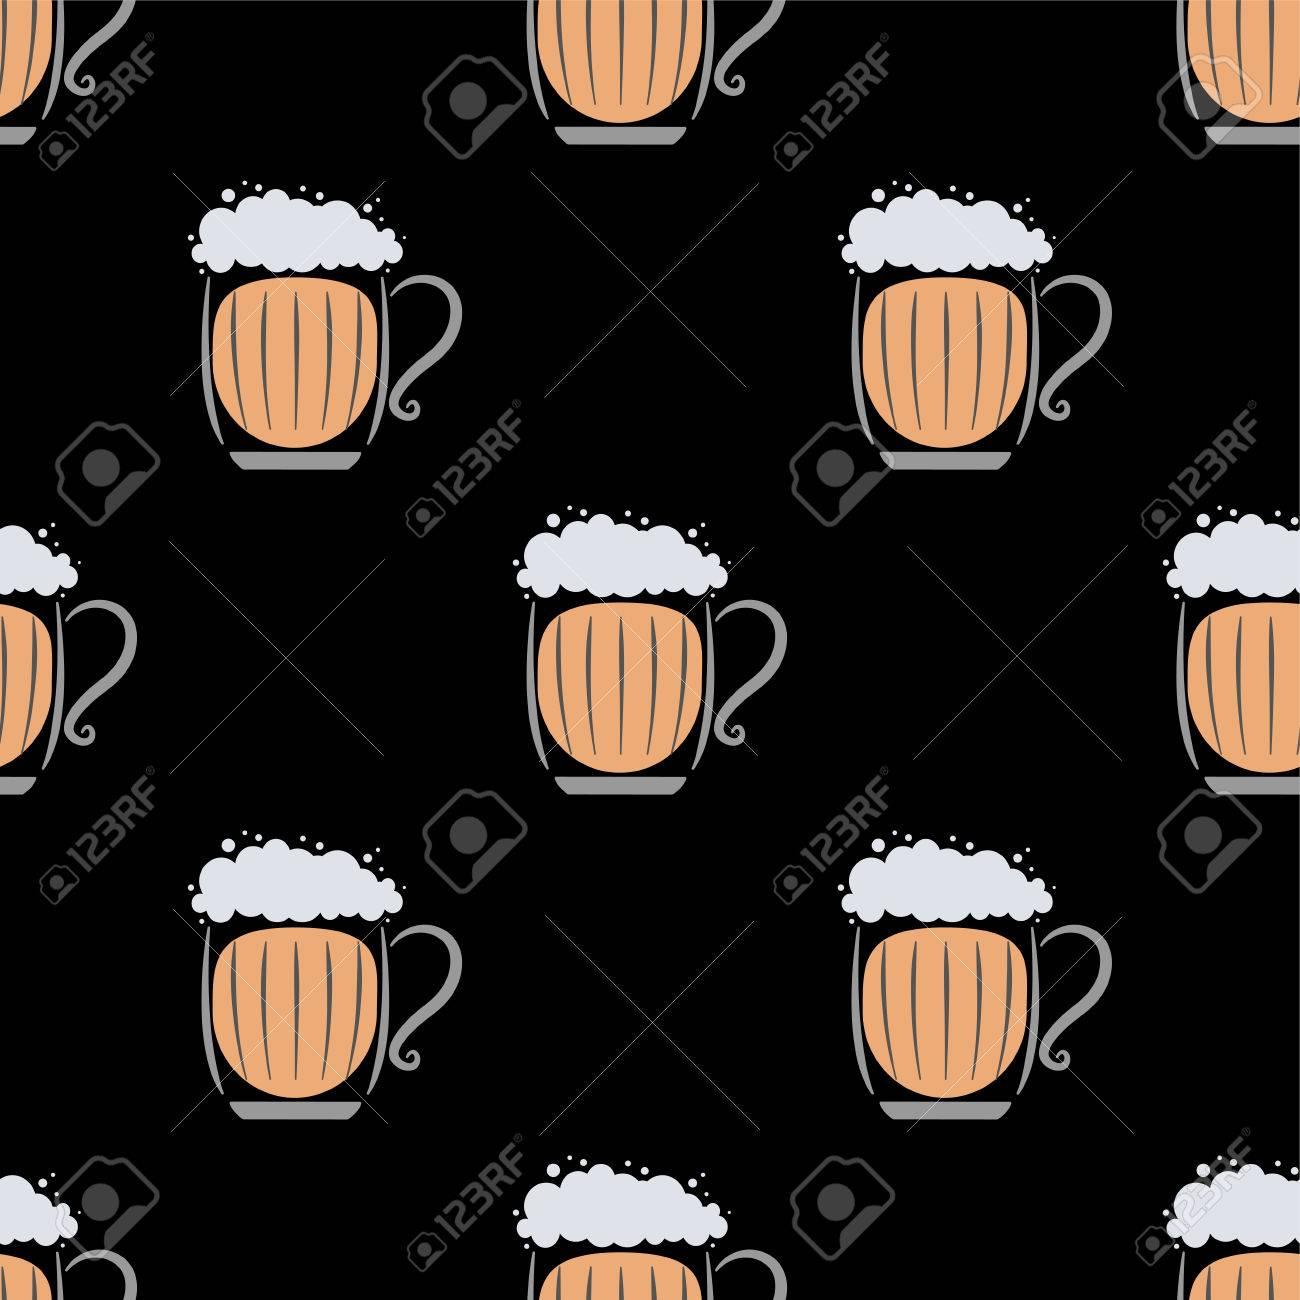 Cartoon Beer Mug Seamless Wallpaper